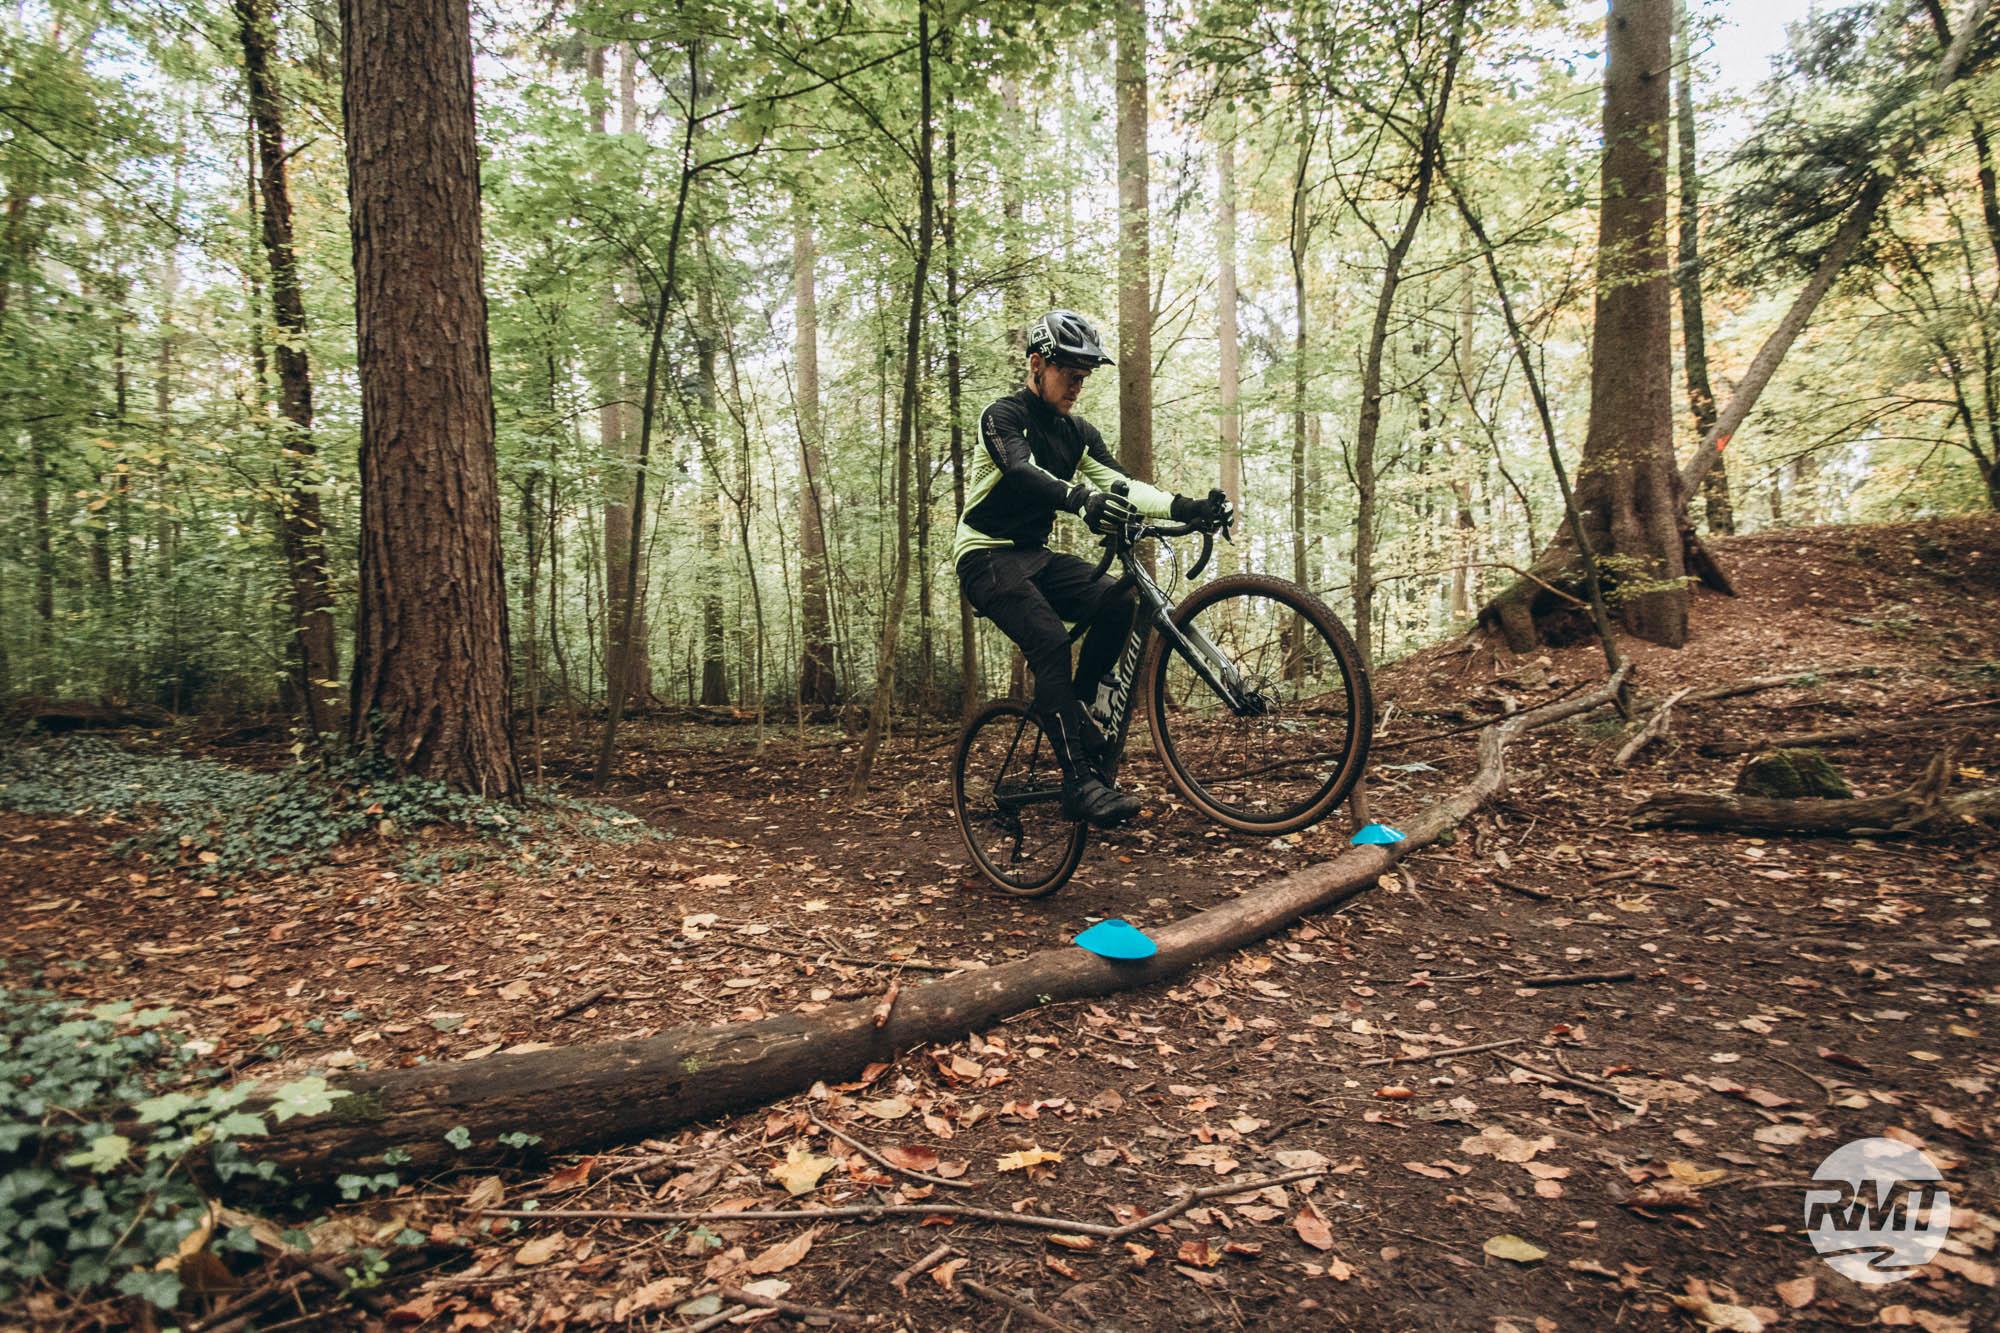 Fahrtechnik Training Kurs Gravel -Cyclocross -Rock my Trail - Bikeschule--3